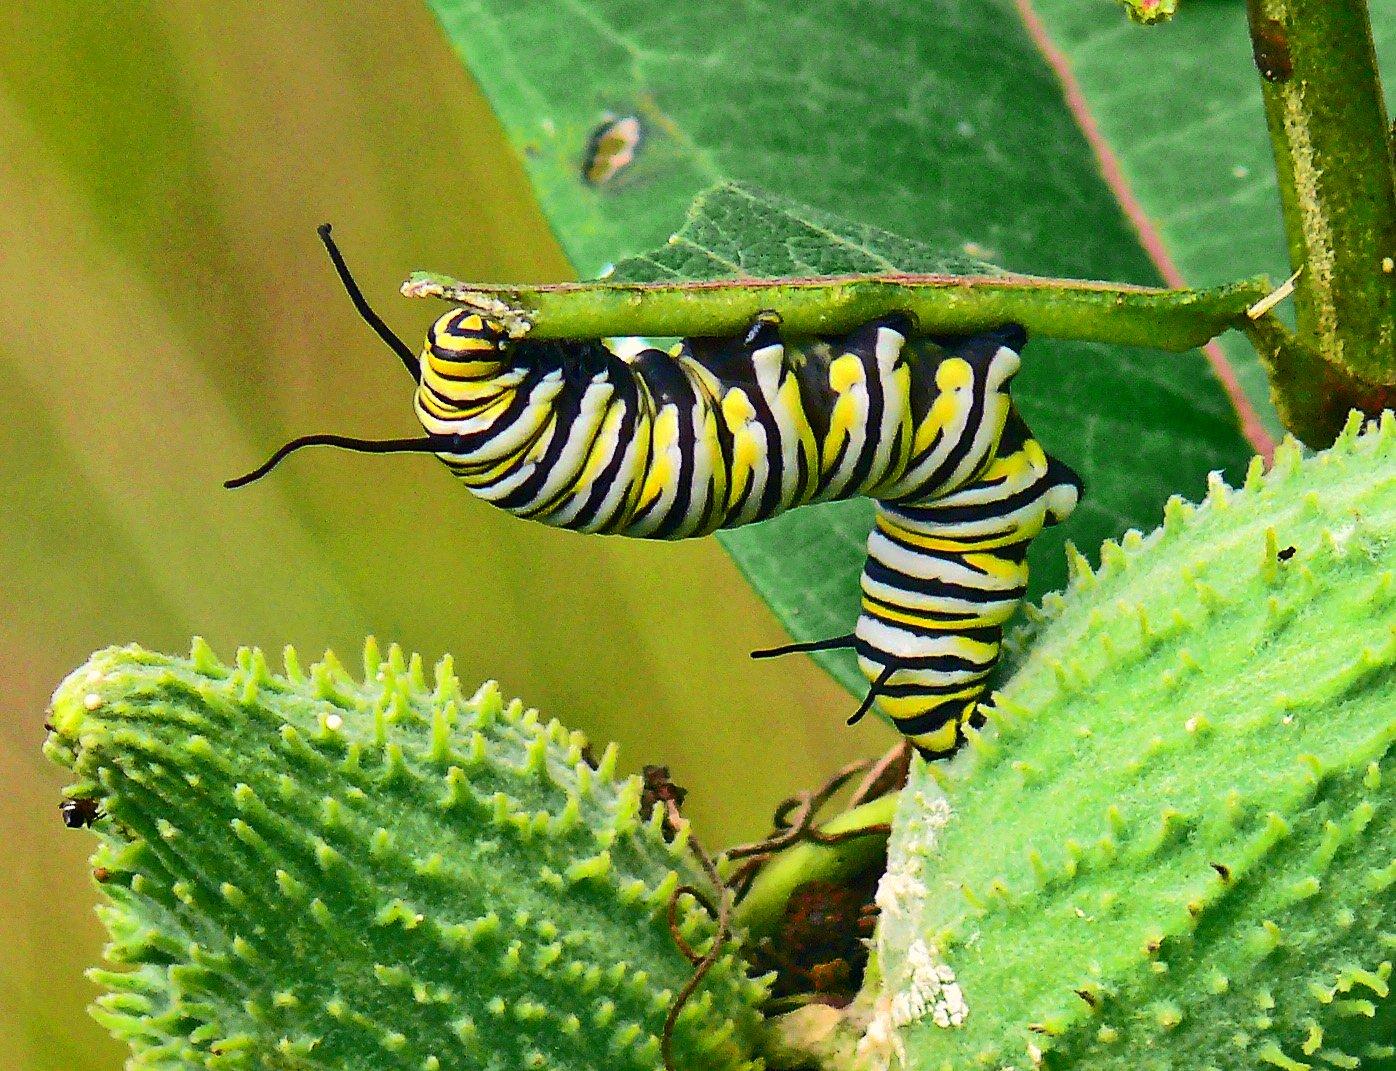 Caterpillar chews on a stem of a leaf